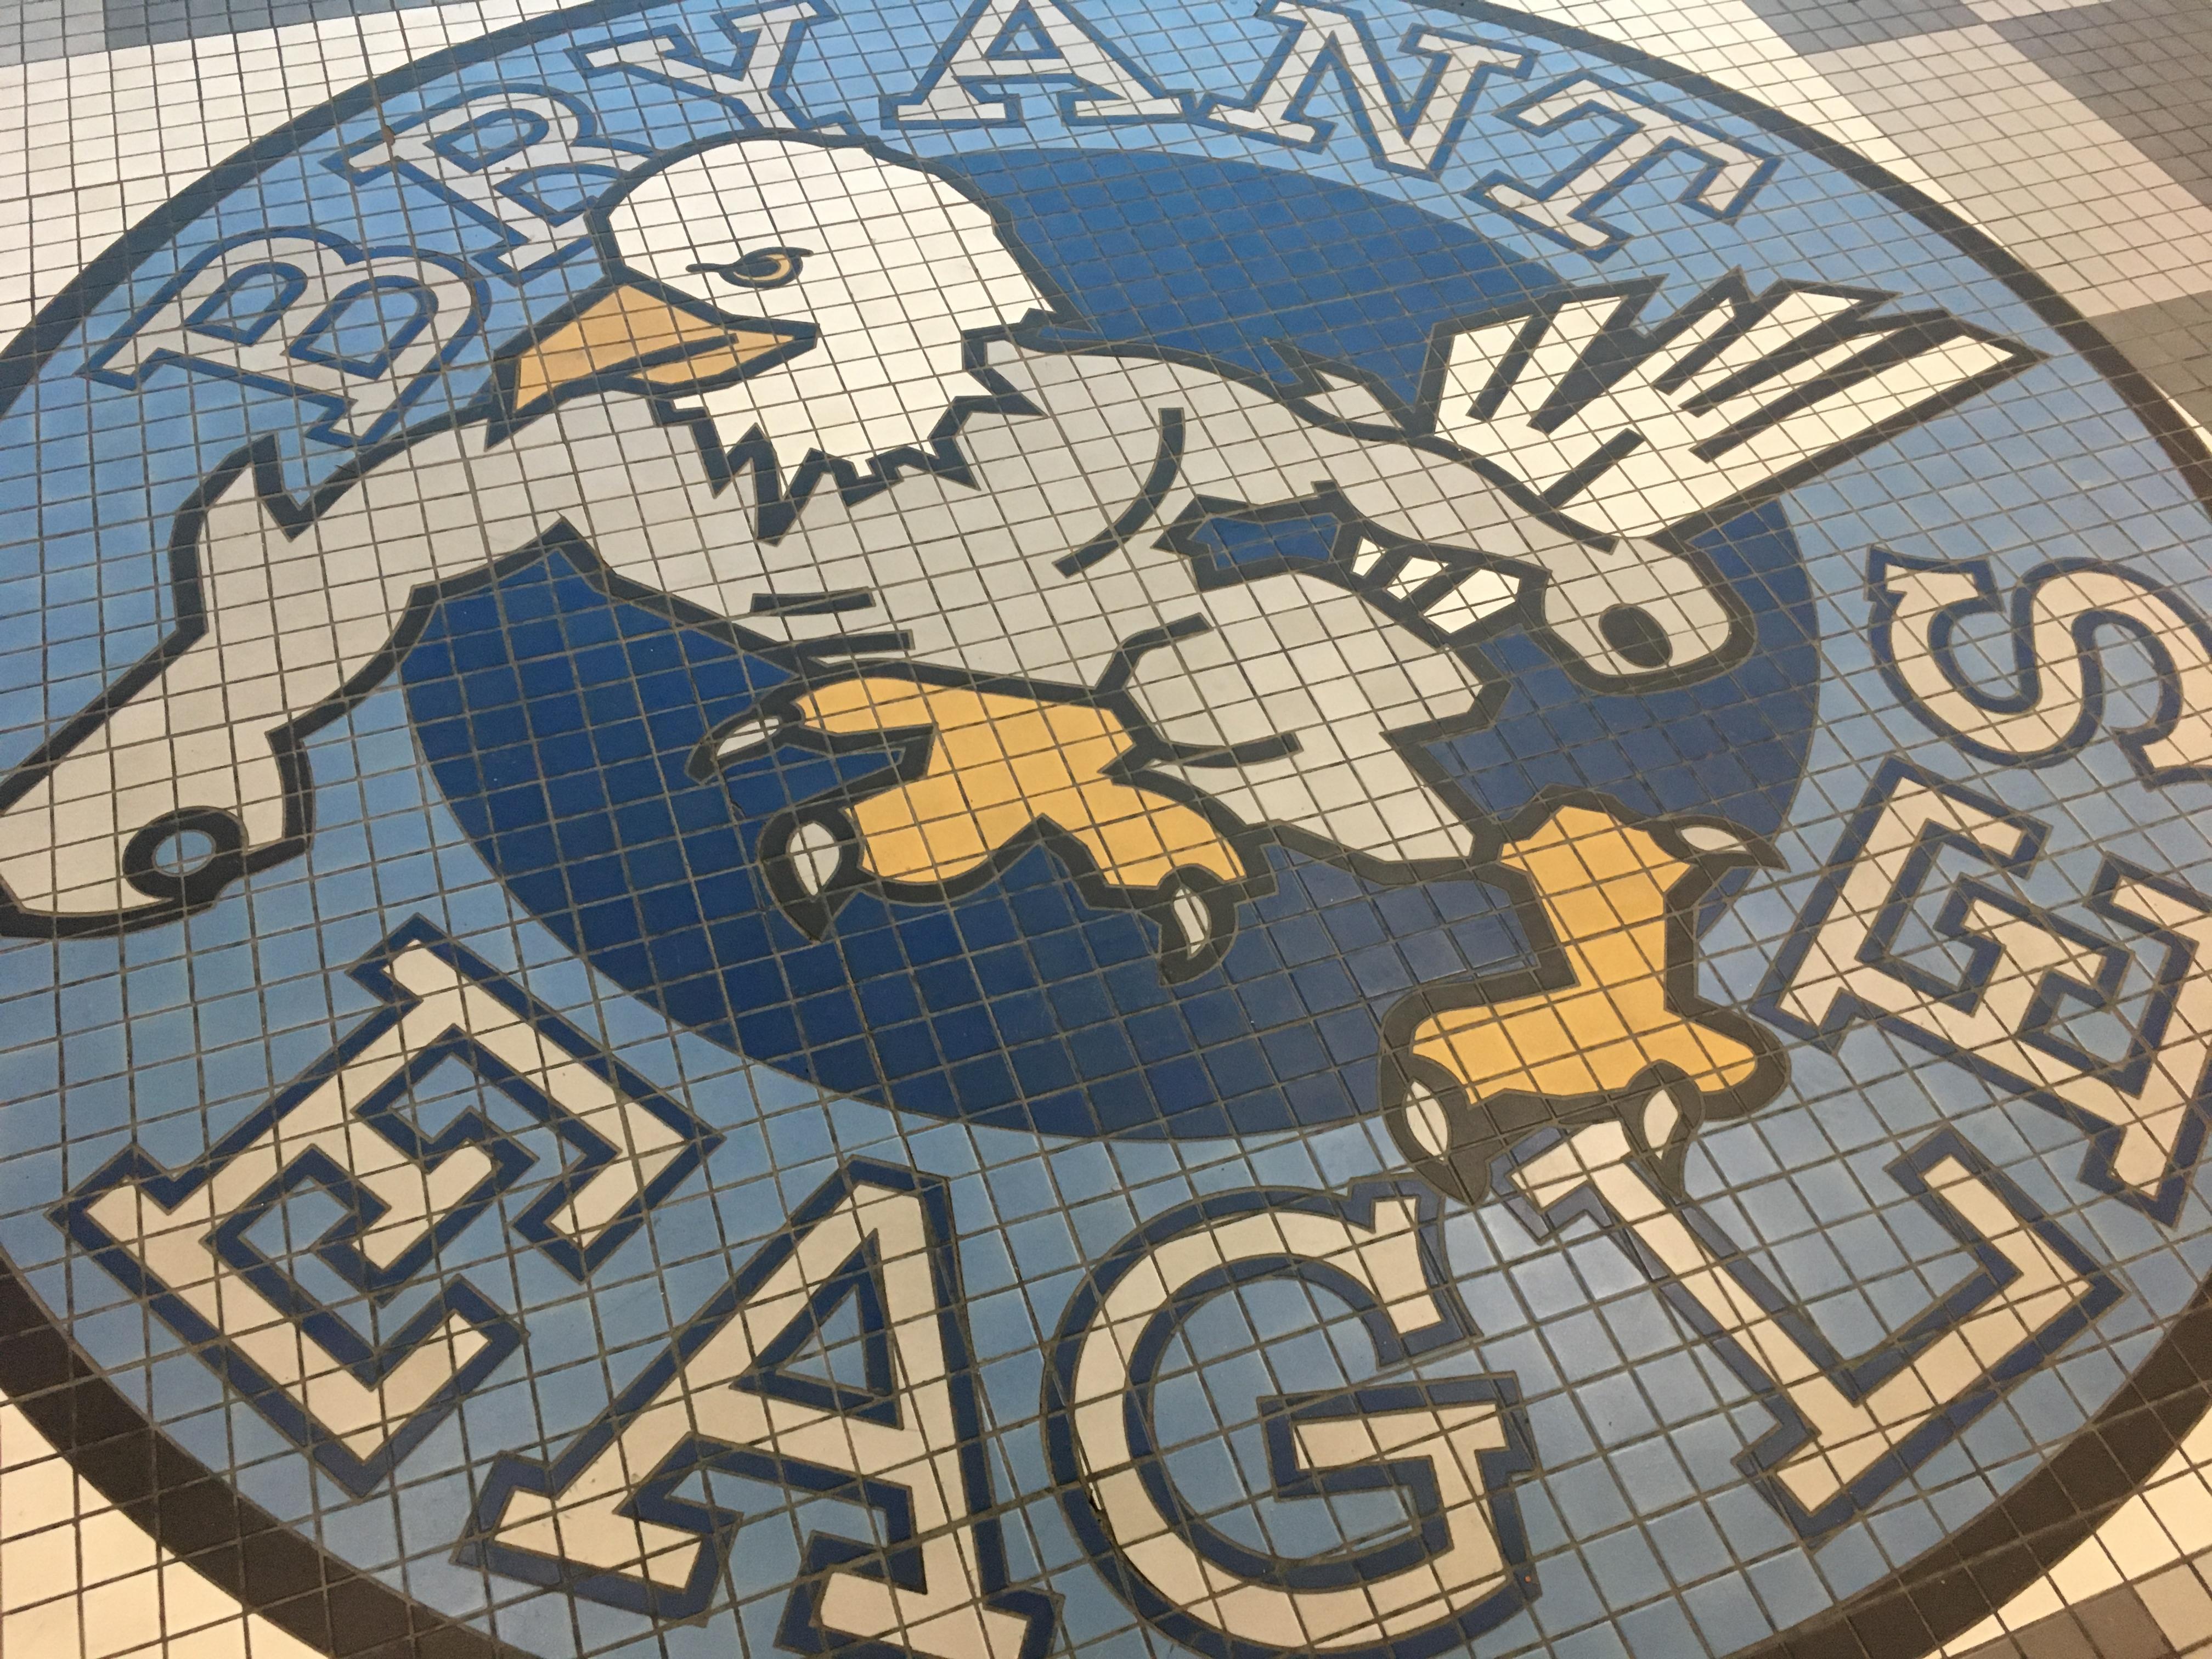 Bryant eagles logo tile mosaic